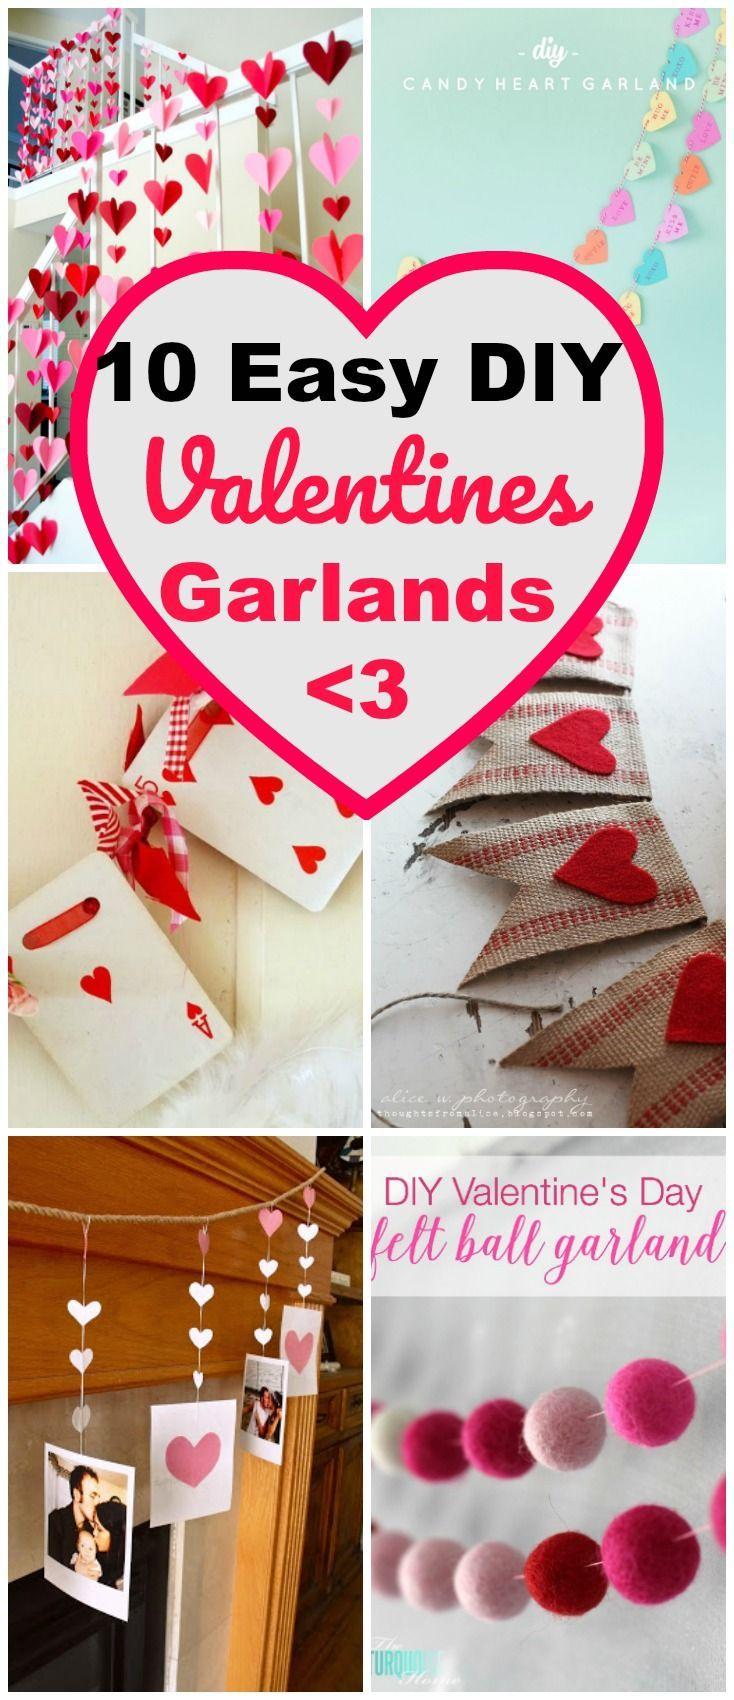 valentines day diy garlands ~ 10 easy garland wall art ideas for feb